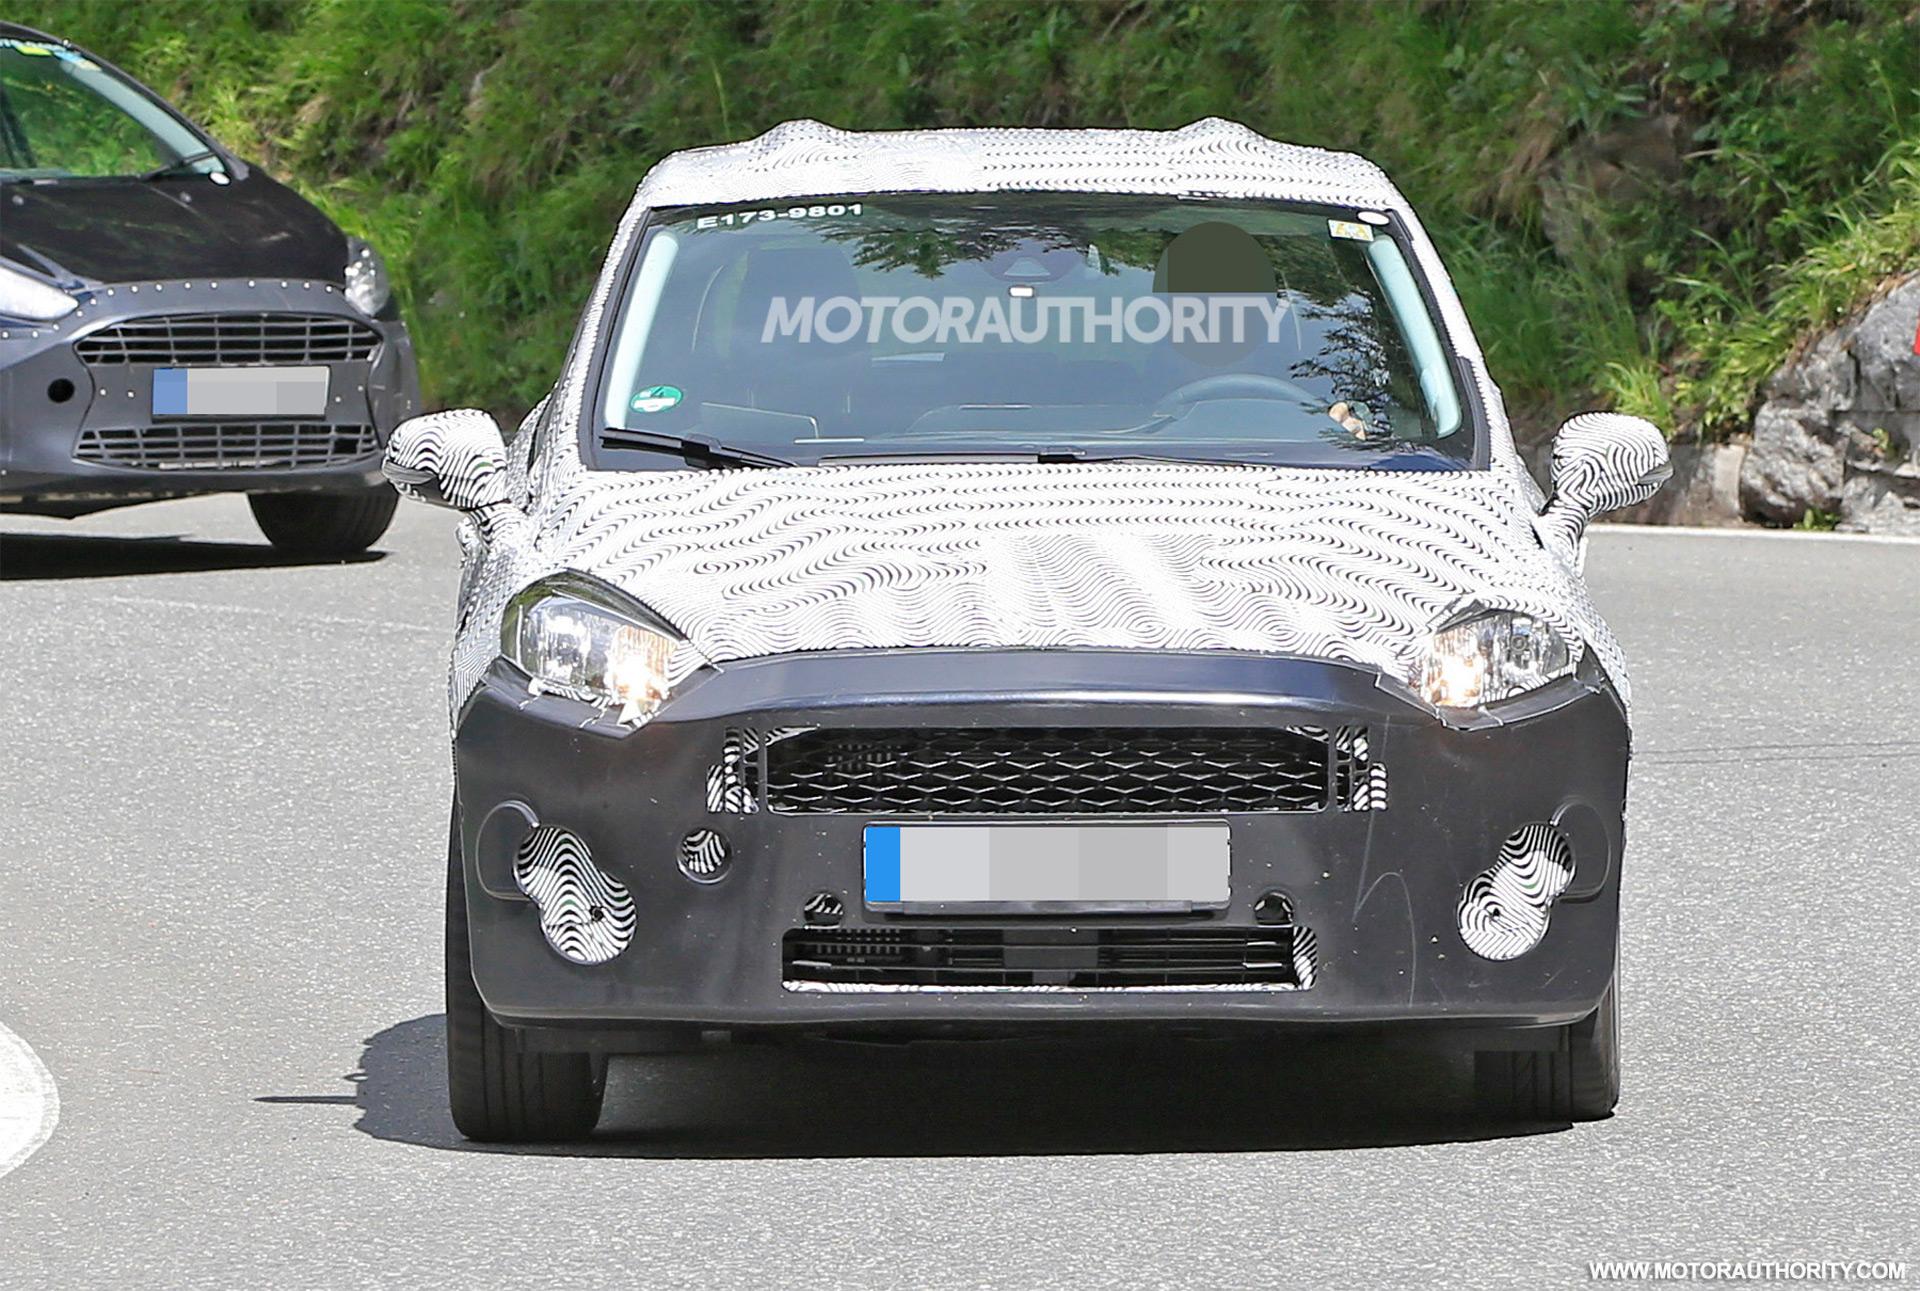 2017 - [Ford] Fiesta MkVII  - Page 3 2018-ford-fiesta-spy-shots--image-via-s-baldauf-sb-median_100555624_h